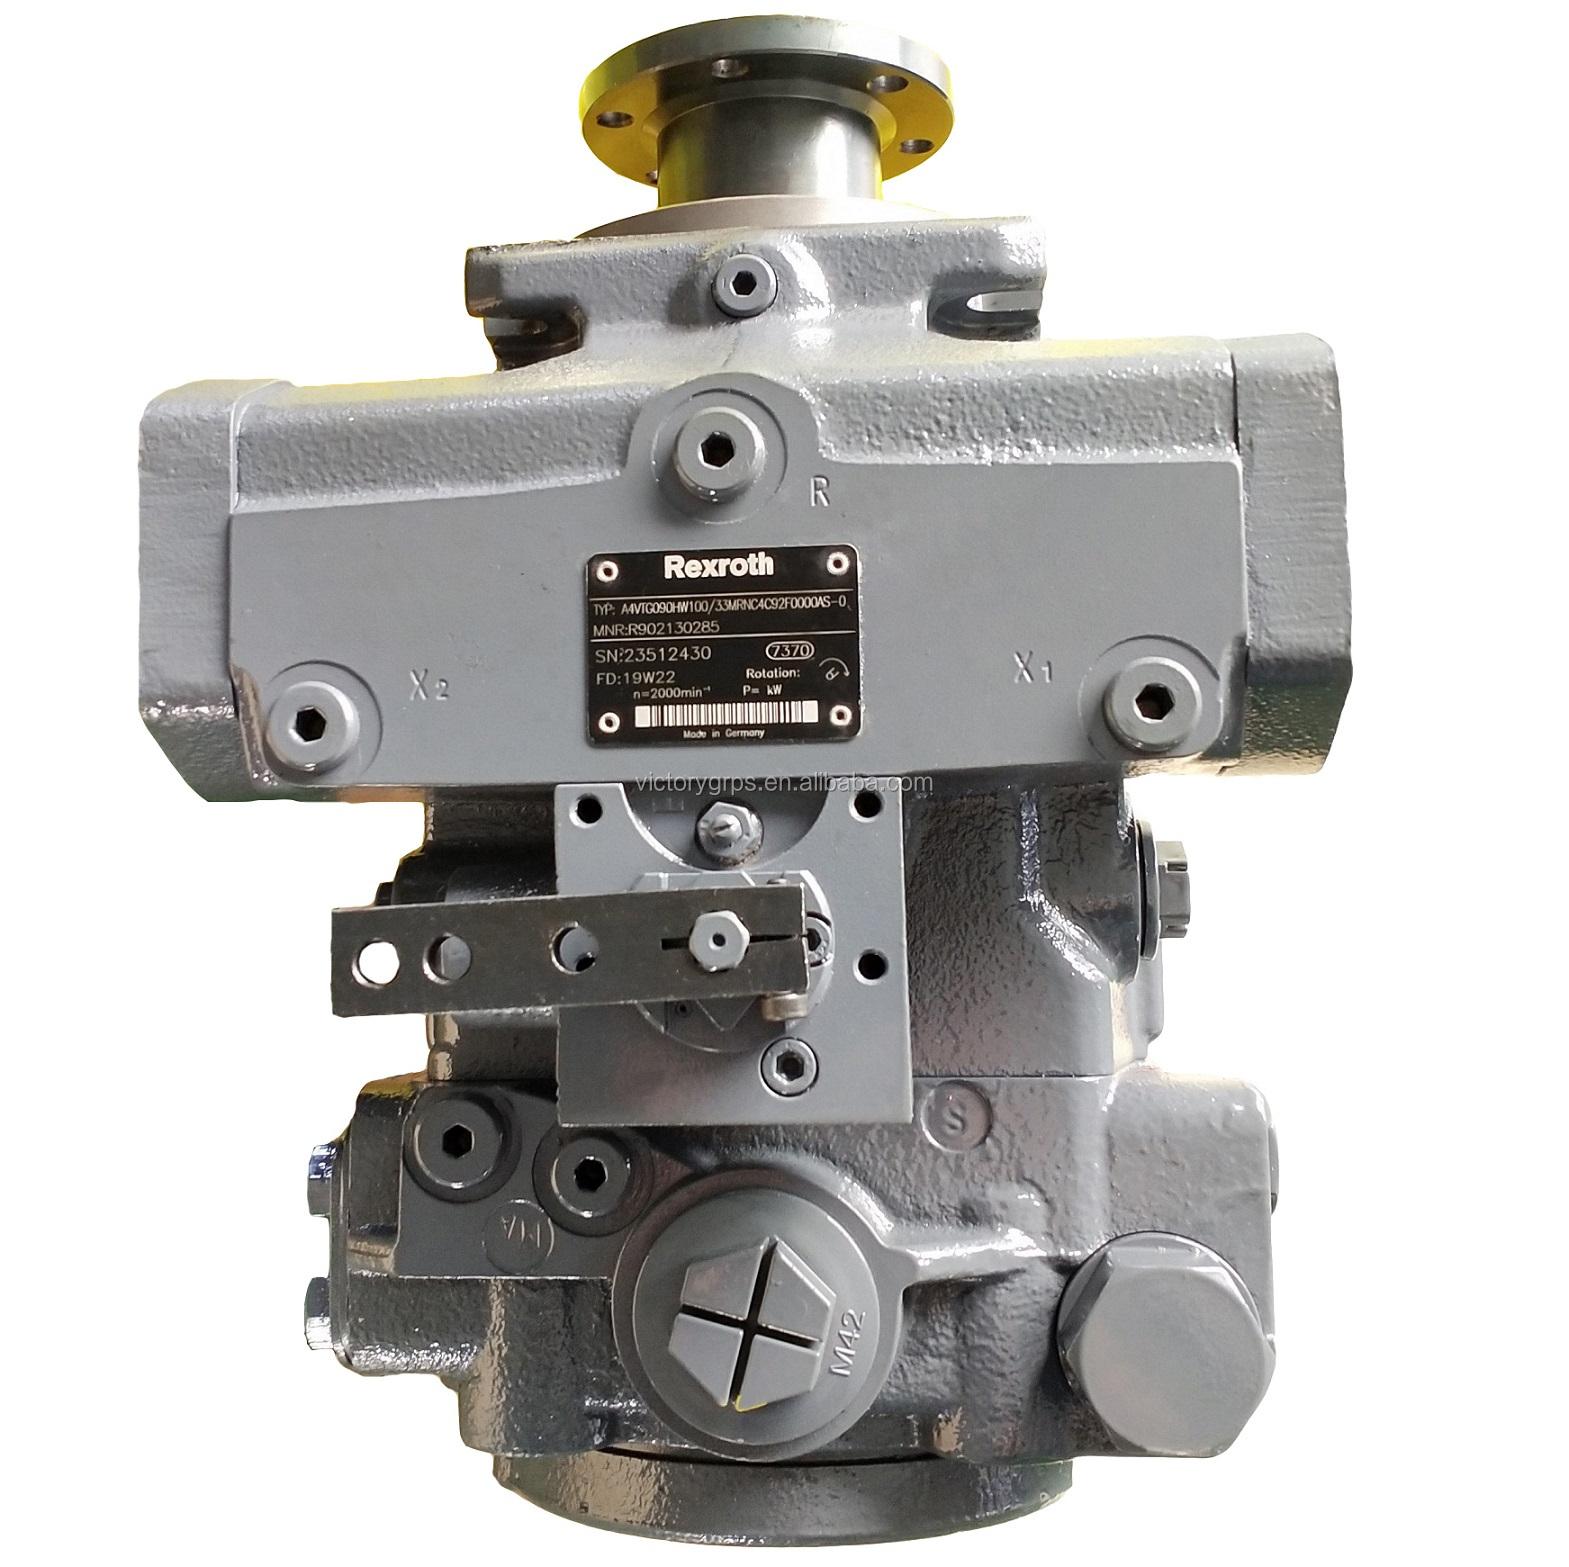 Concrete Mixers Axial Piston Brueninghaus Hydromatik Mannesmann A4VTG71, A4VTG71HW, A4VTG90, A4VTG90HW Rexroth A4VTG Charge pump